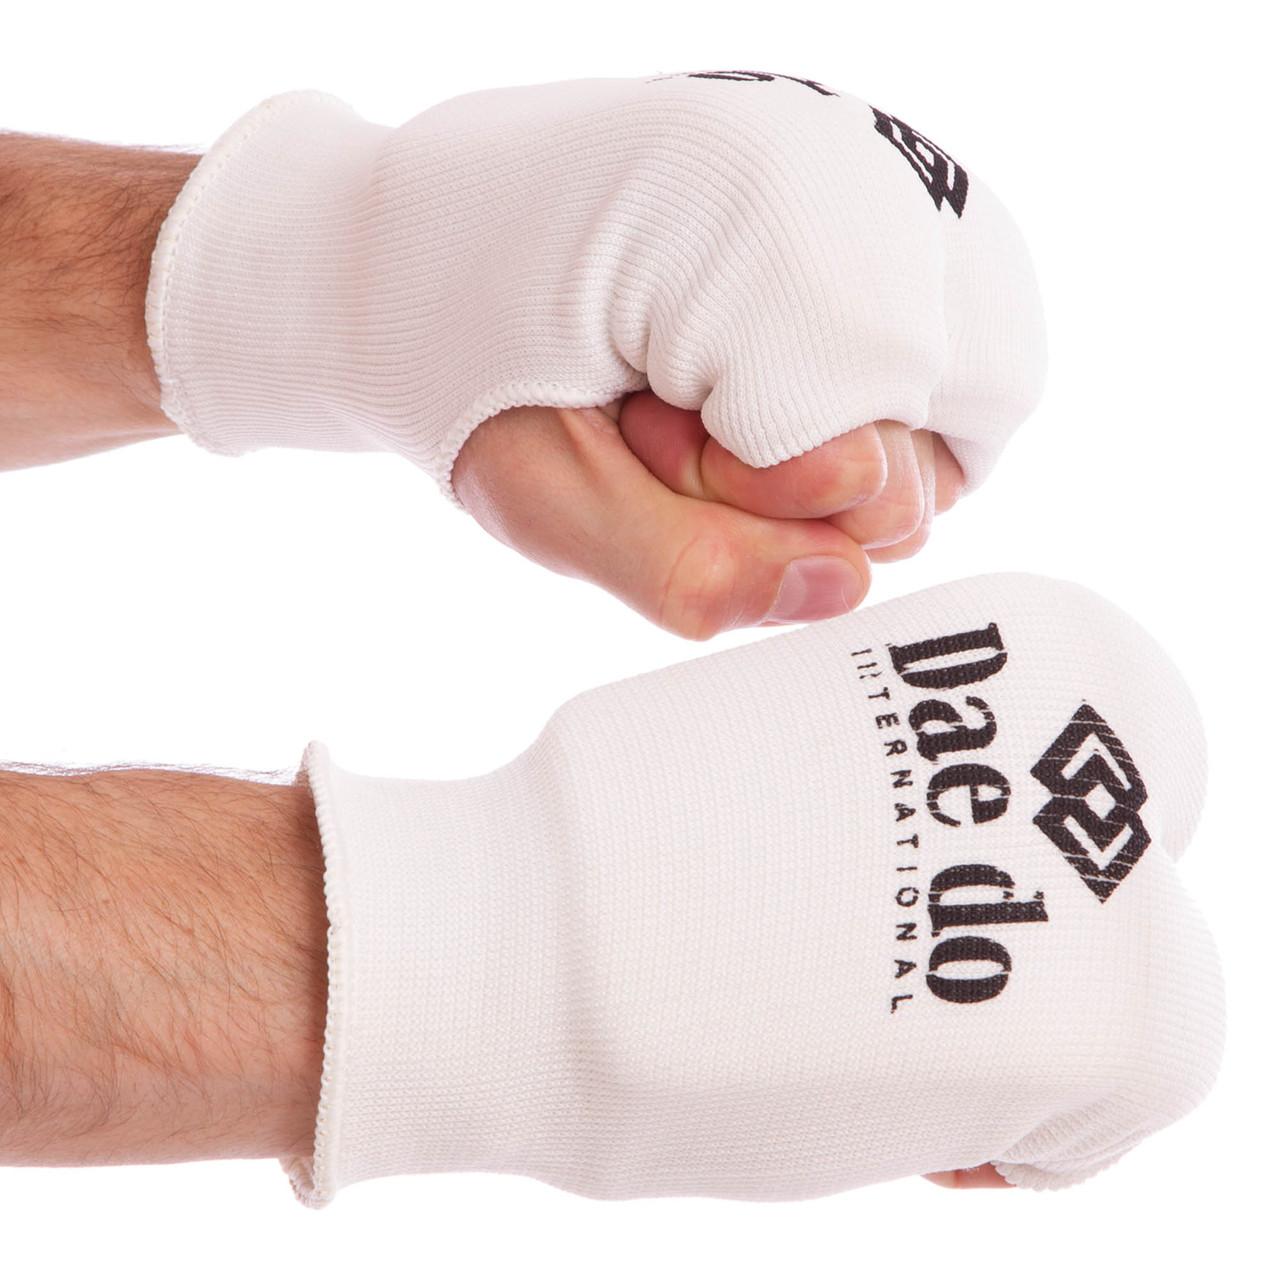 Накладки (перчатки) для каратэ Daedo 0009 (PL, хлопок, эластан, размер M, белый)